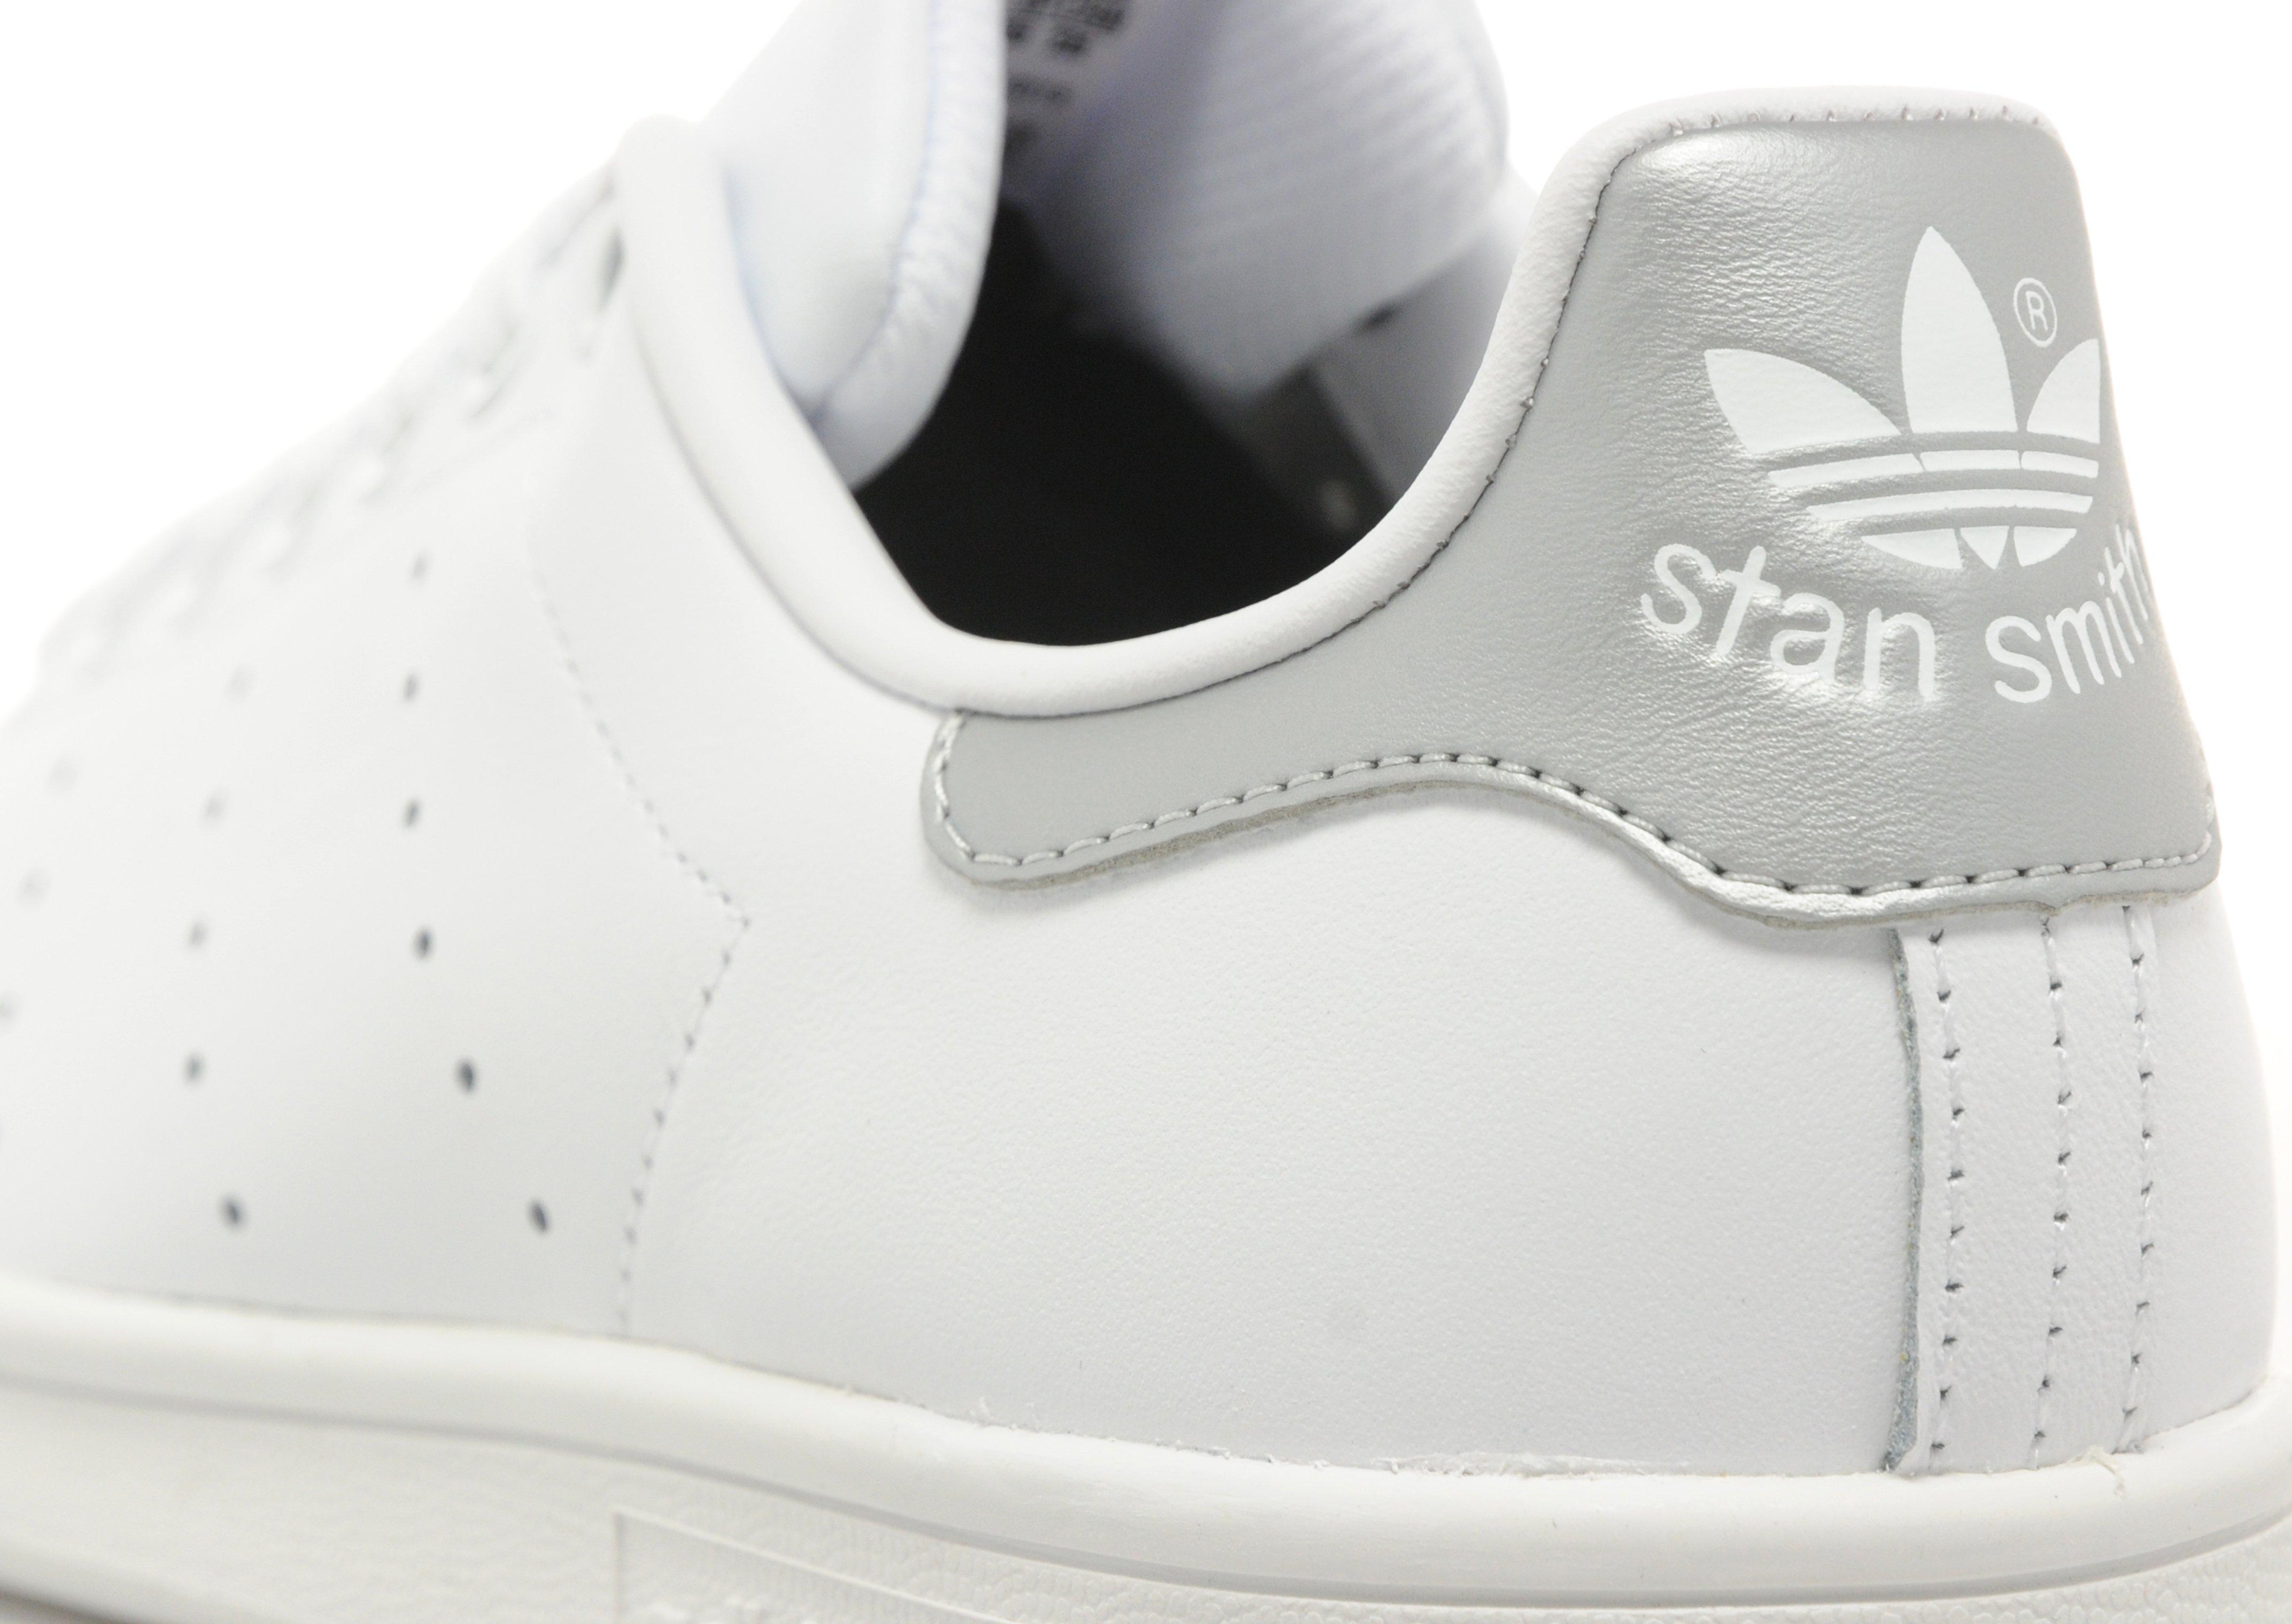 buy stan adidas Navitas Software